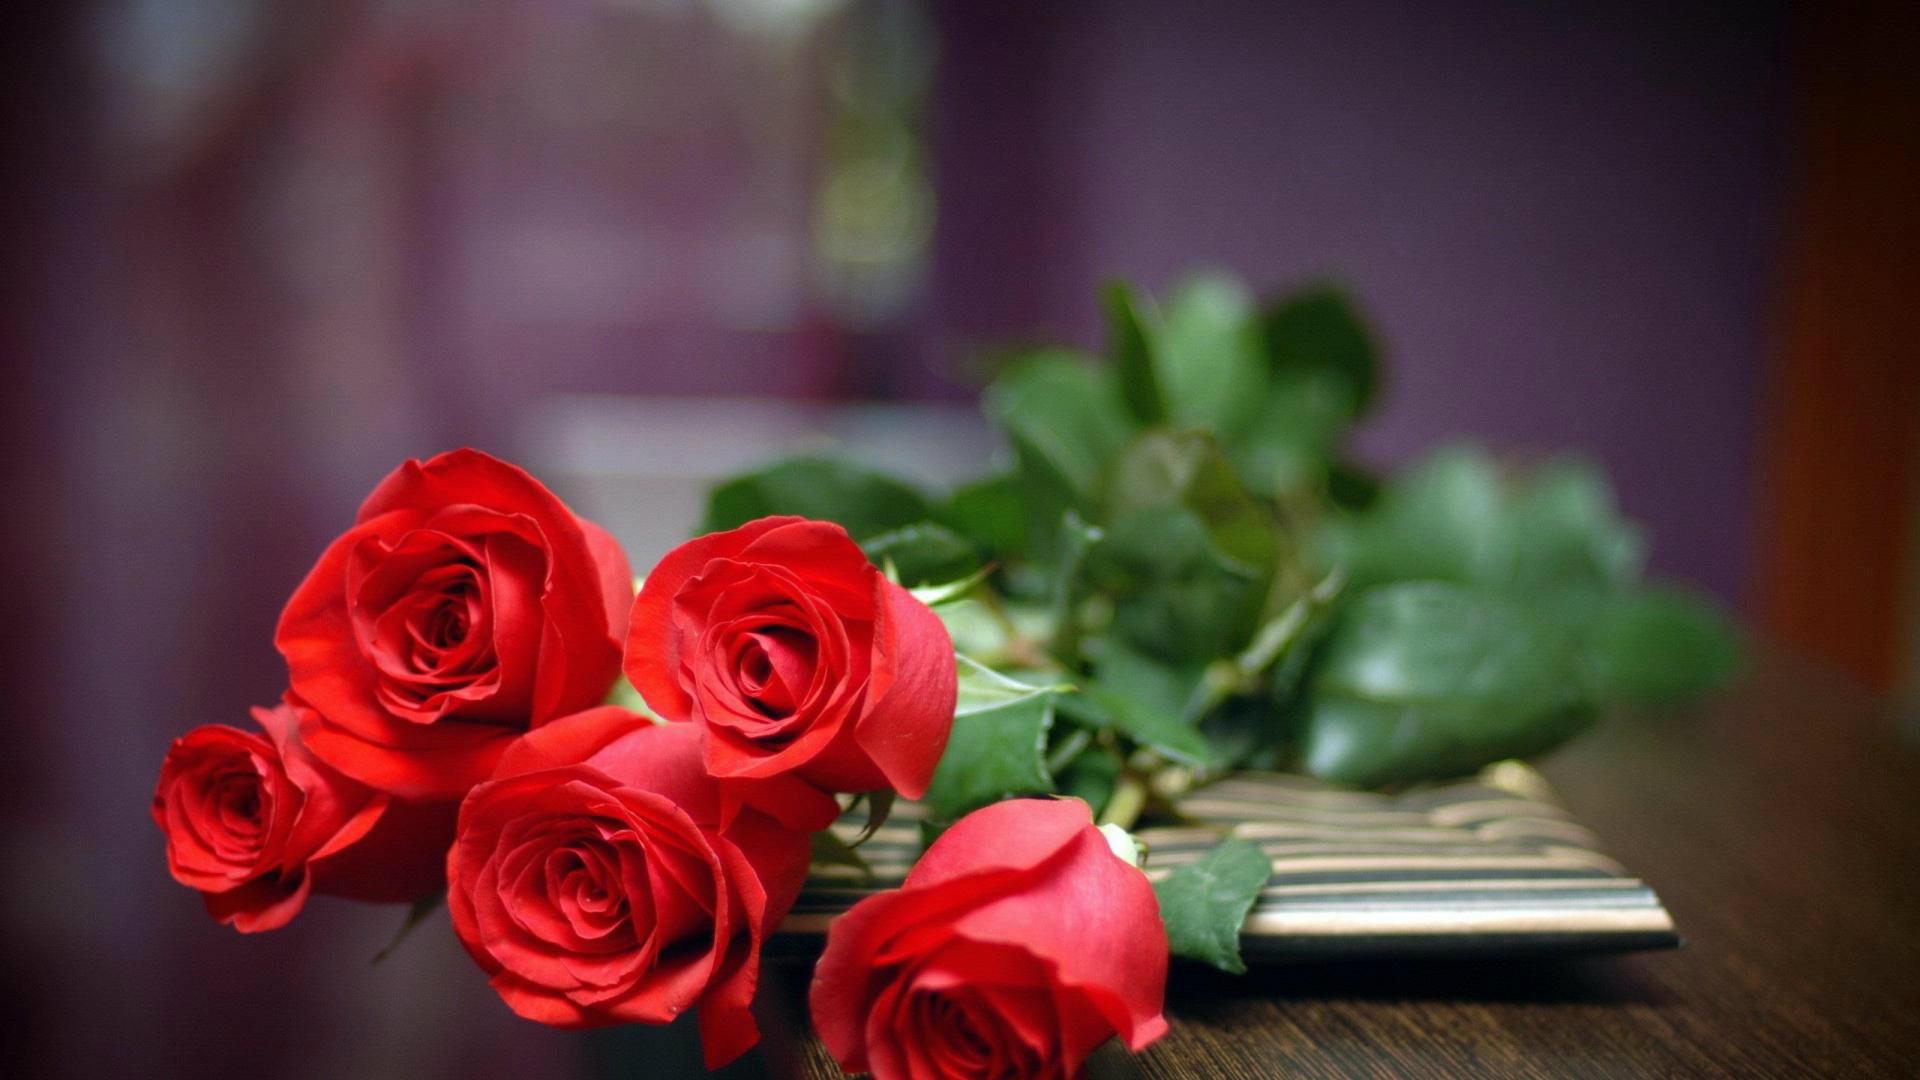 Red Rose Wallpaper 72 Images